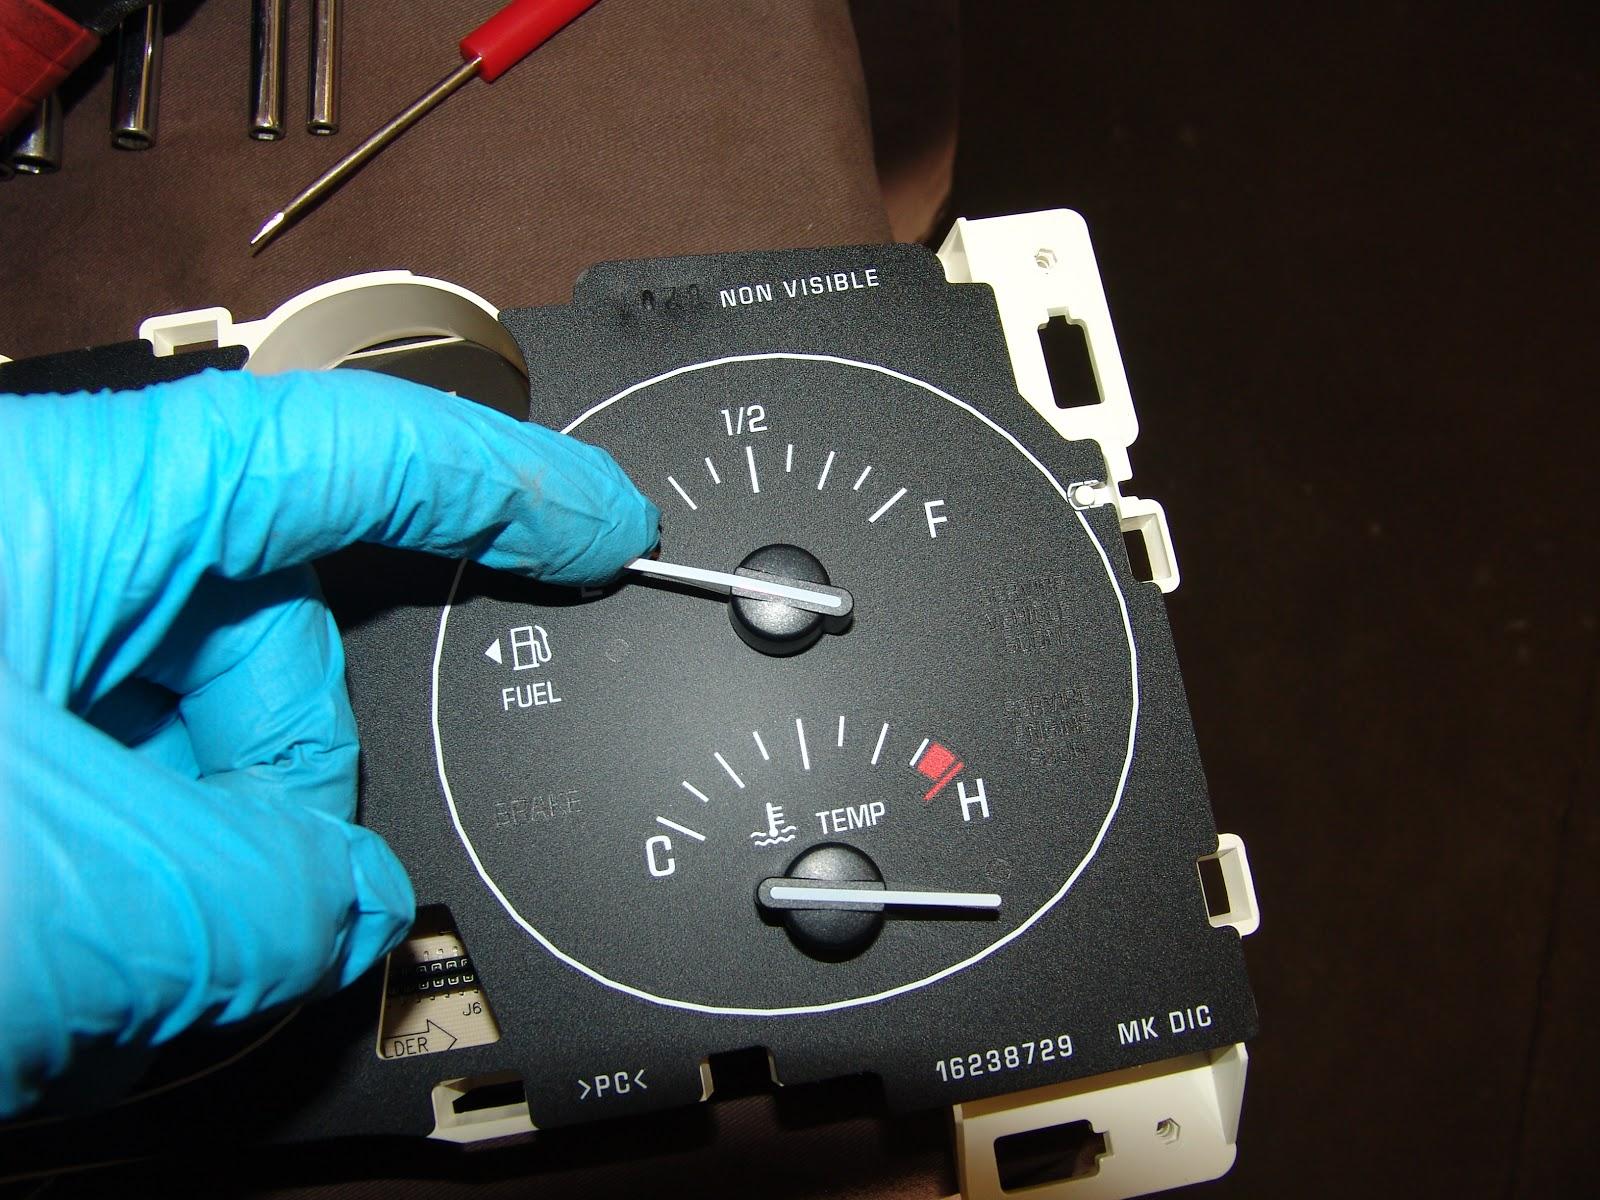 2002 Buick Rendezvous Electrical Diagram Autos Post